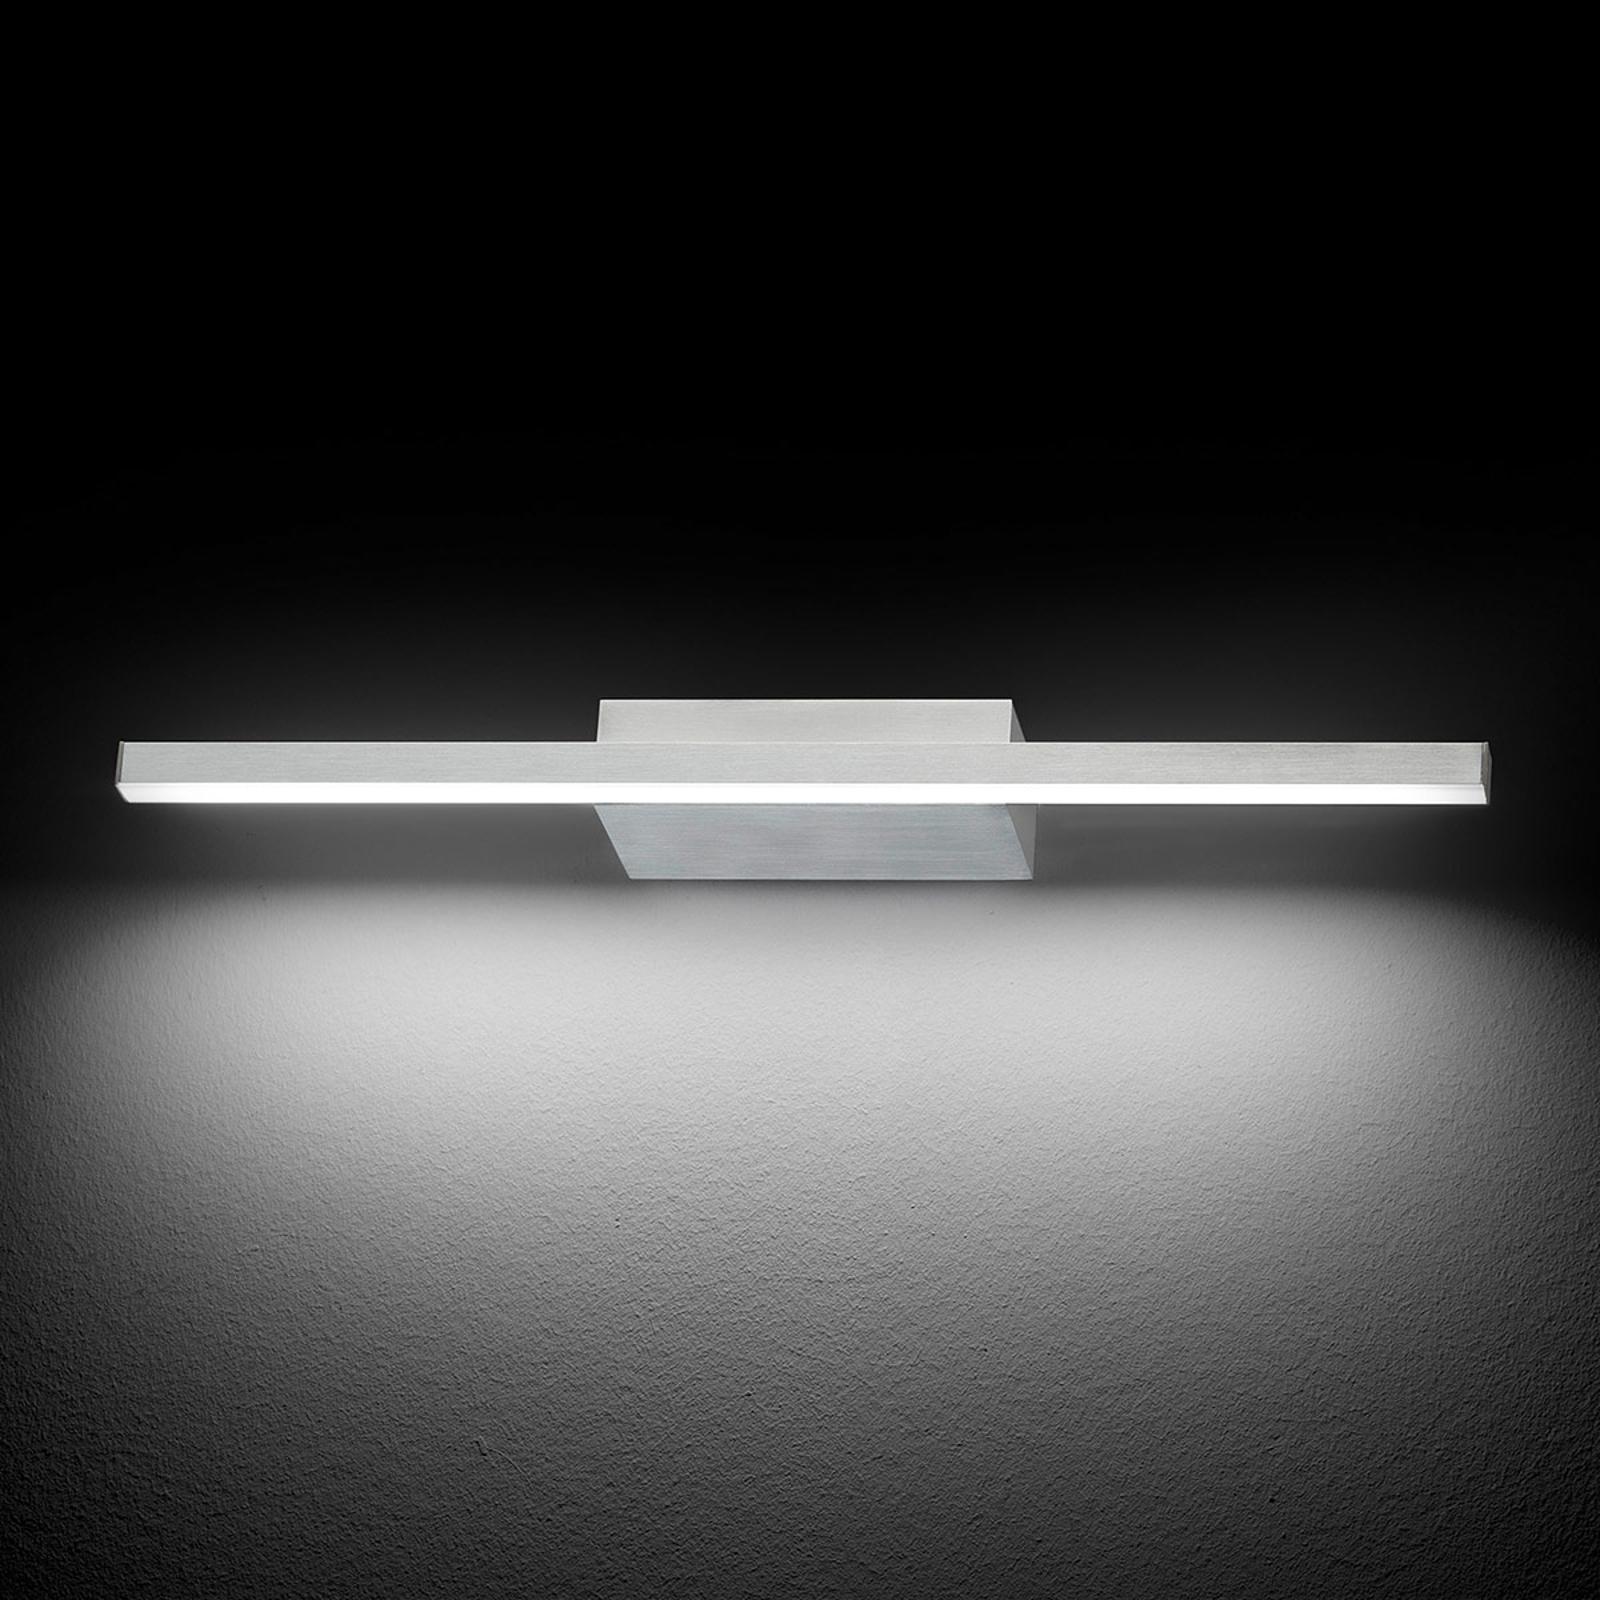 GROSSMANN Forte LED-vägglampa, aluminium 49,4 cm